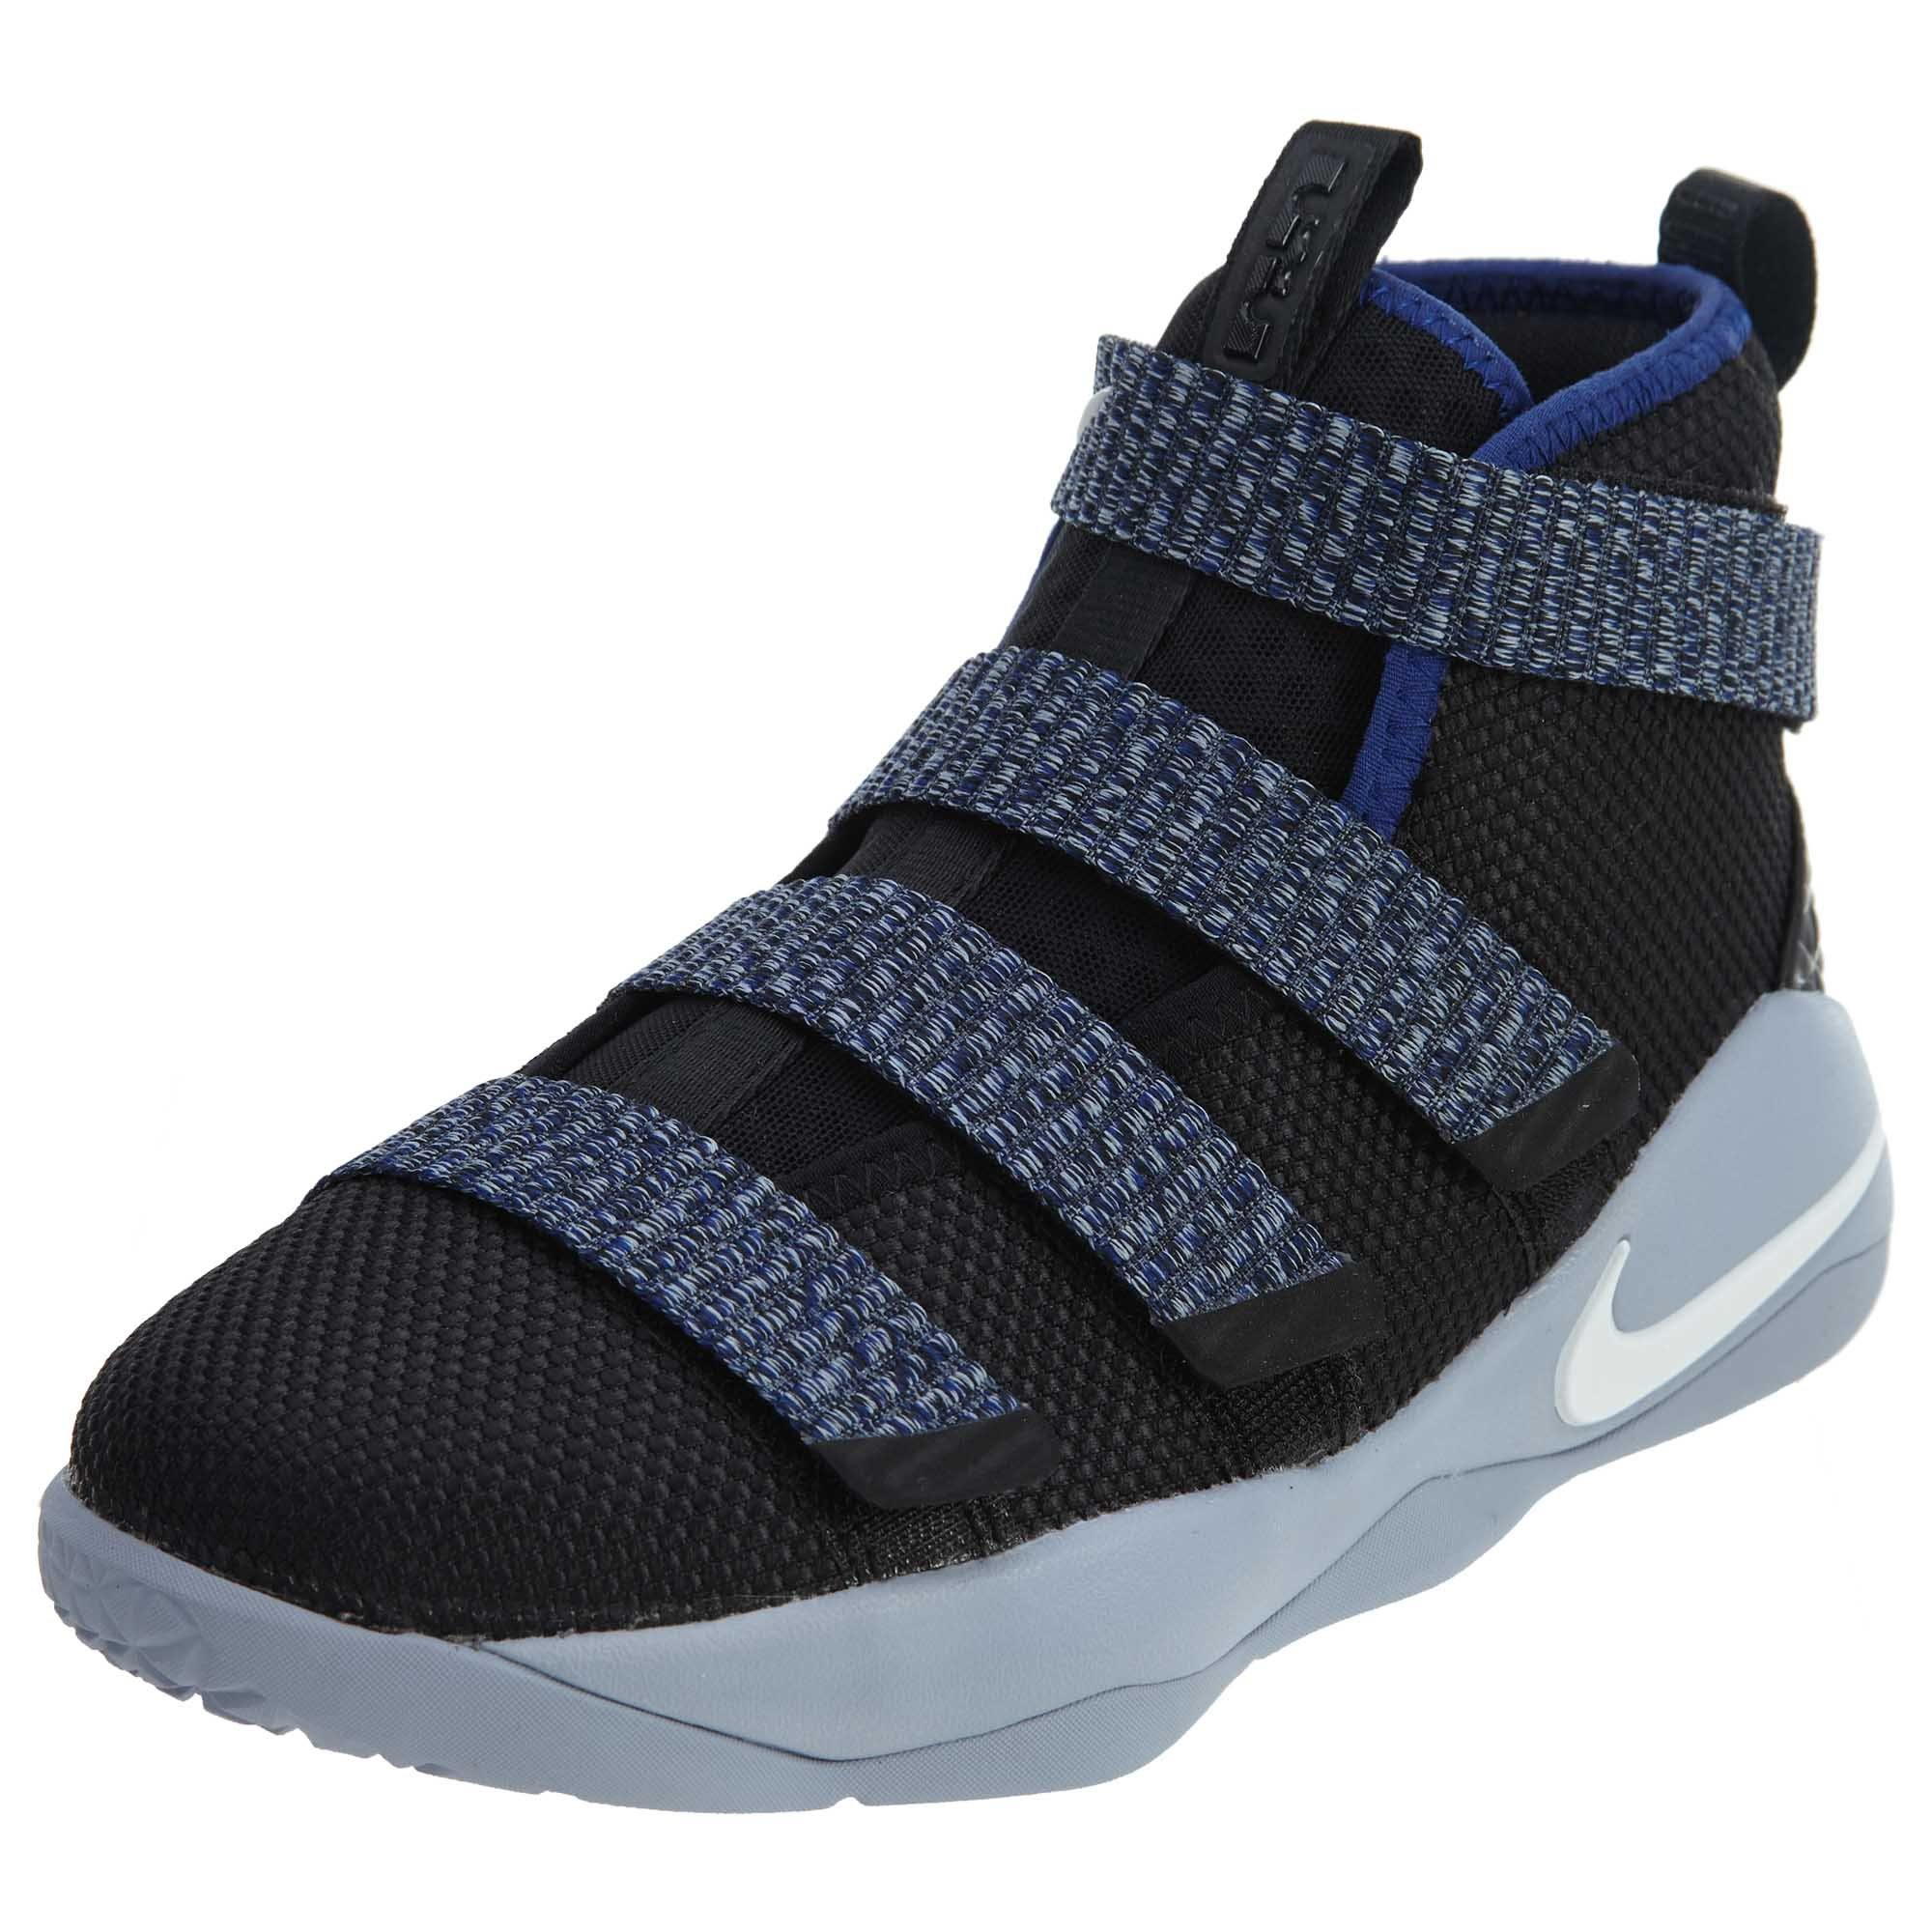 Nike Lebron Soldier Xi Little Kids Style: 918368-005 Size: 2.5 Y US